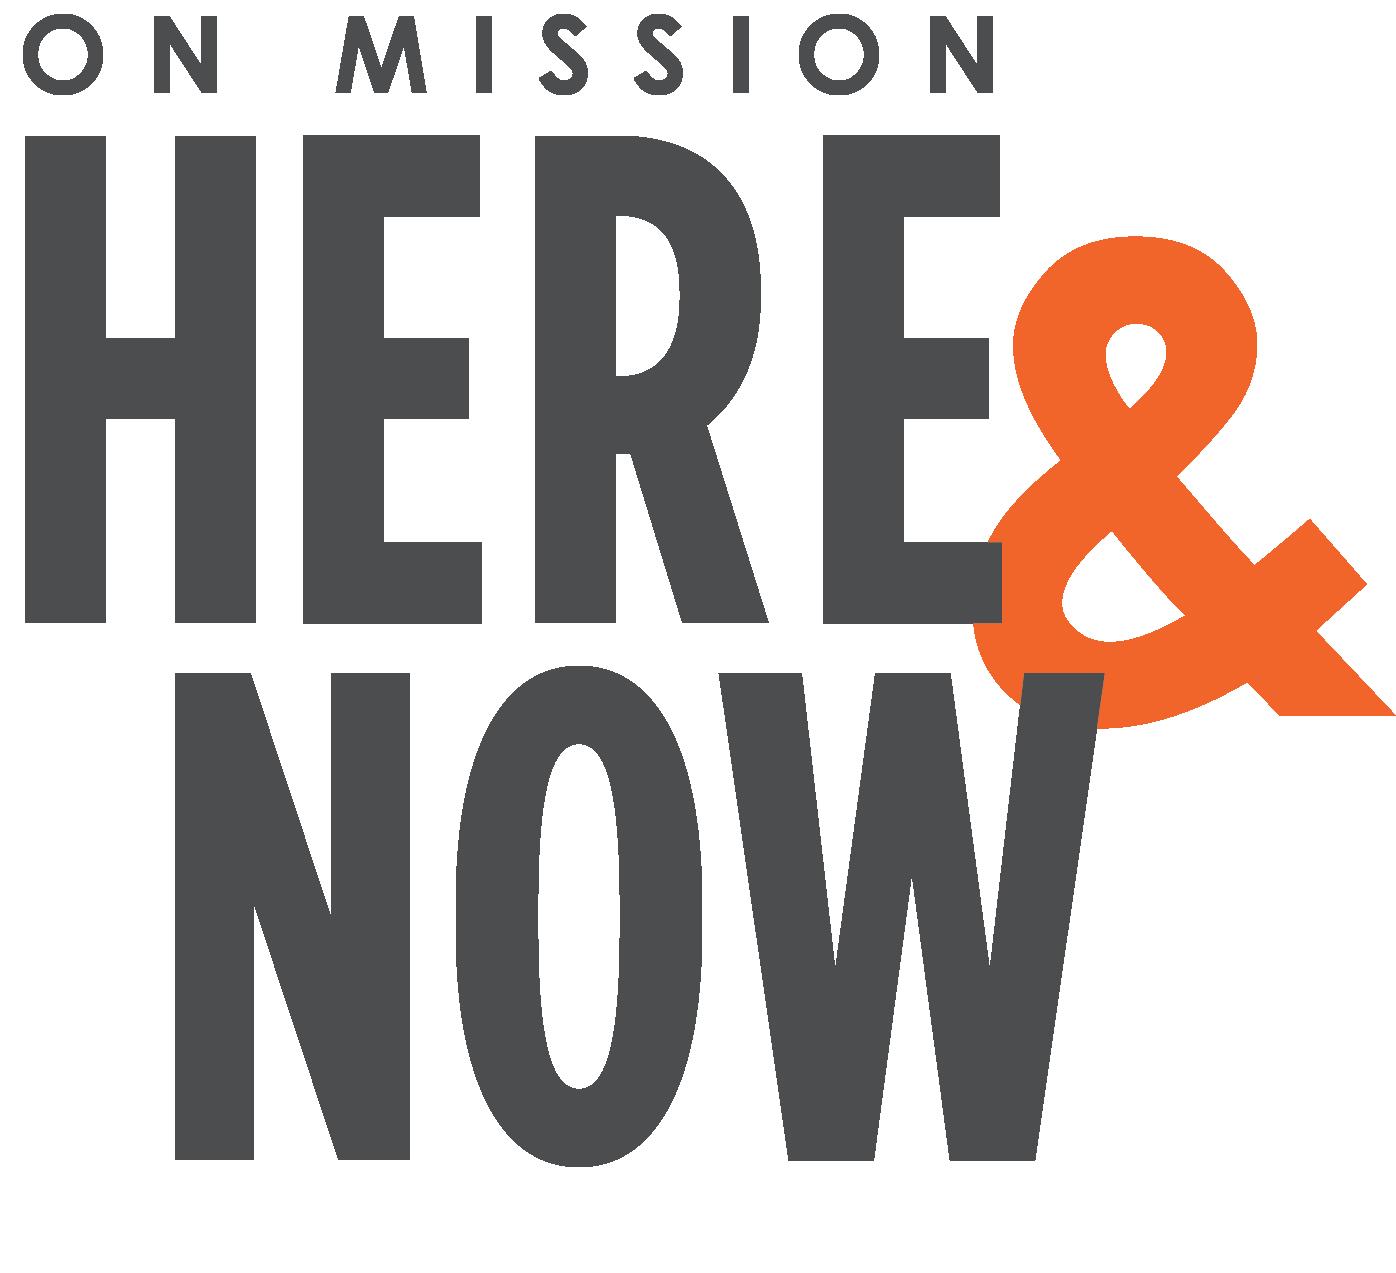 Missionary clipart stewardship, Missionary stewardship.